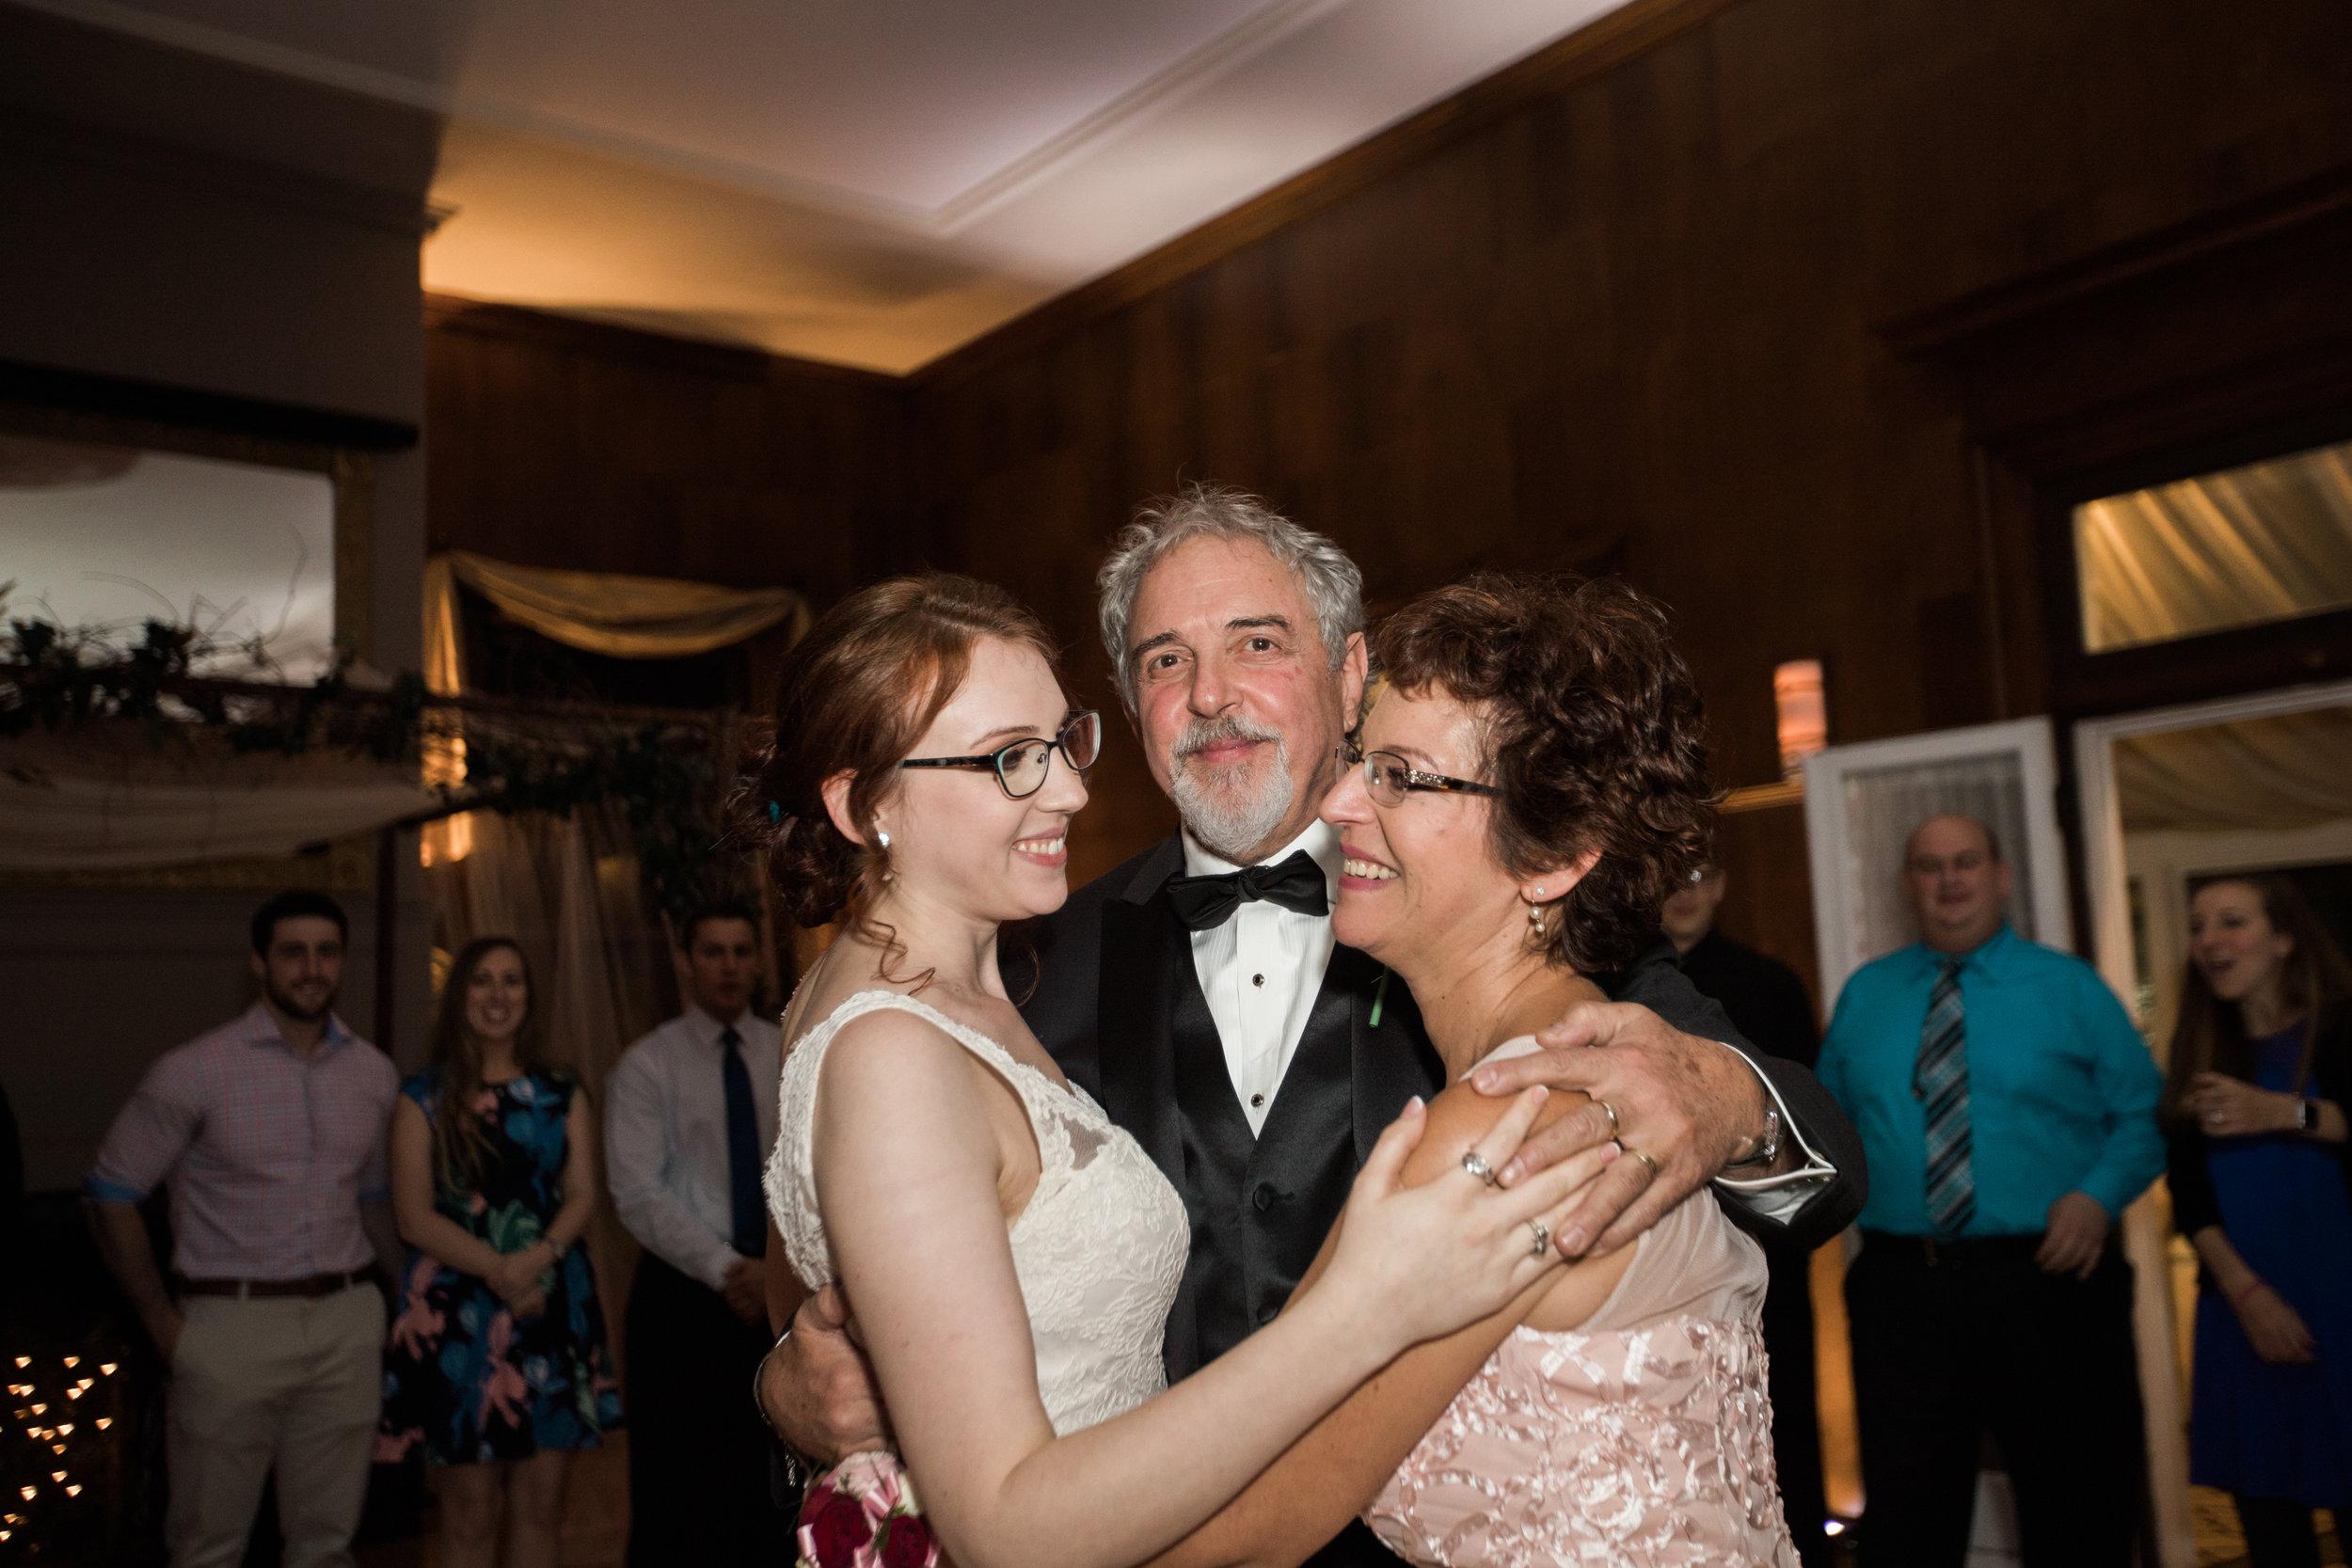 Harry Potter Wedding at Overhills Mansion Catonville Maryland Wedding Photographers Megapixels Media (102 of 134).jpg